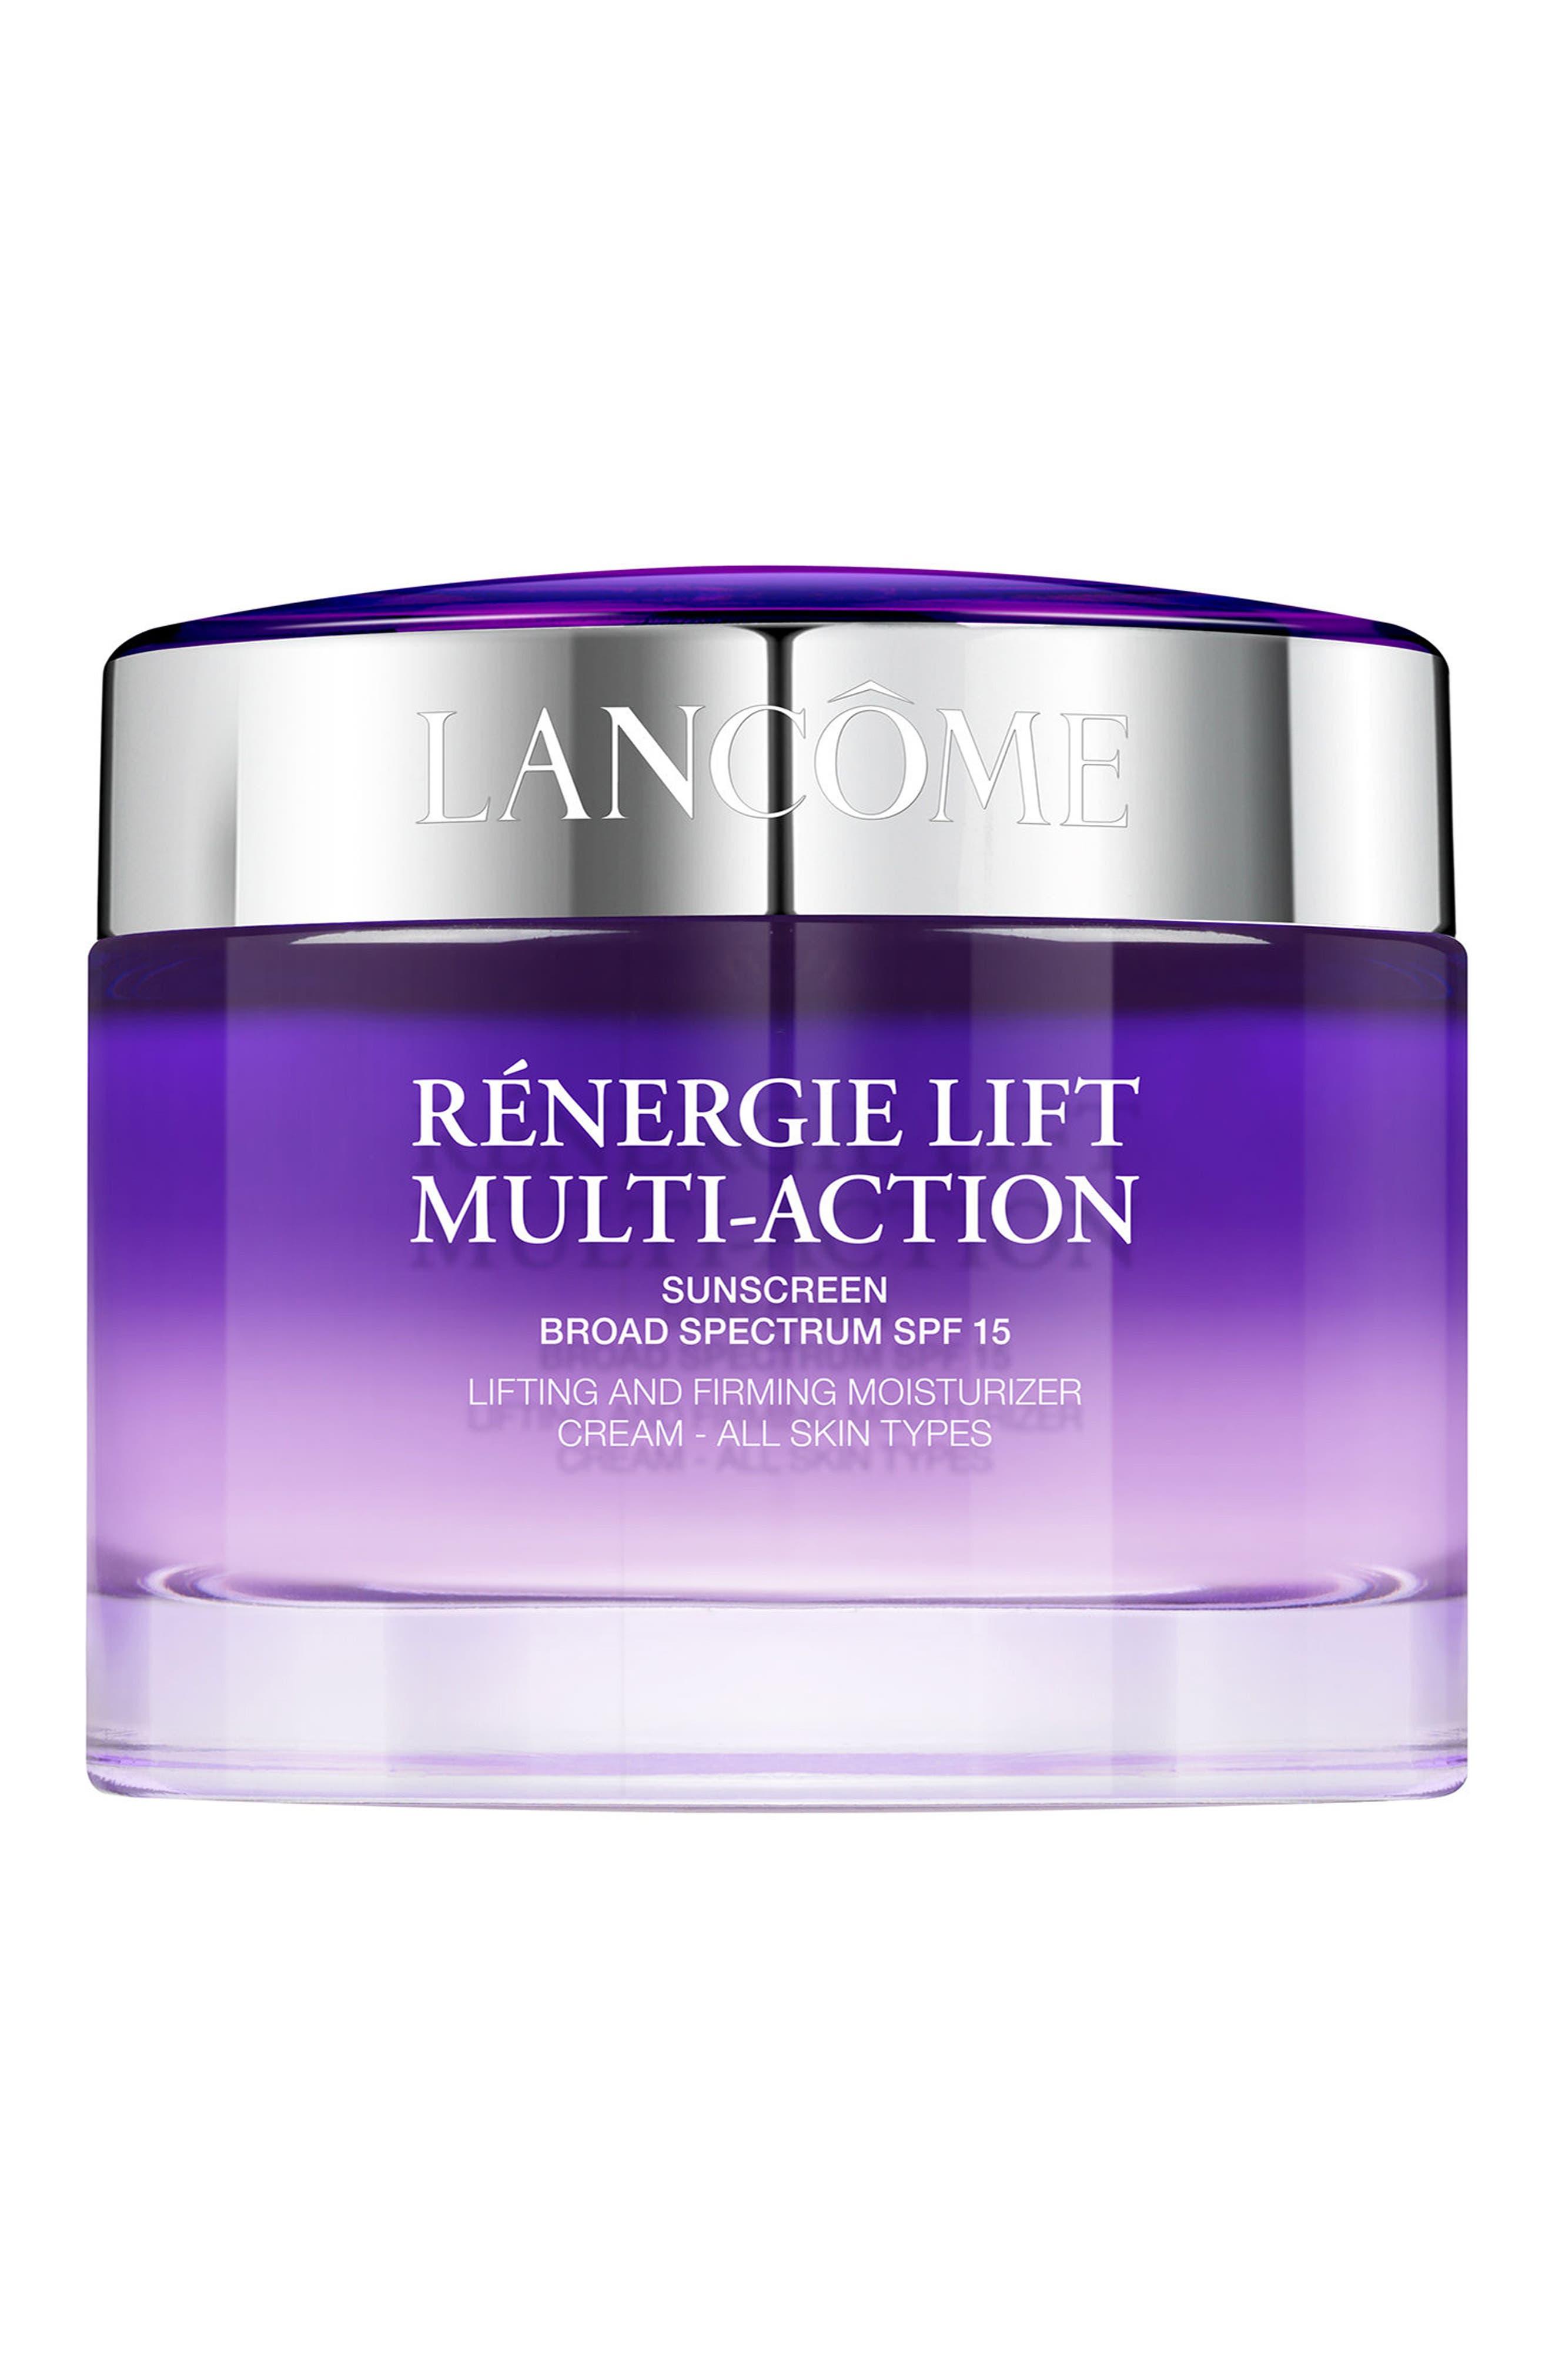 Main Image - Lancôme Rénergie Lift Multi Action Moisturizer Cream SPF 15 for All Skin Types